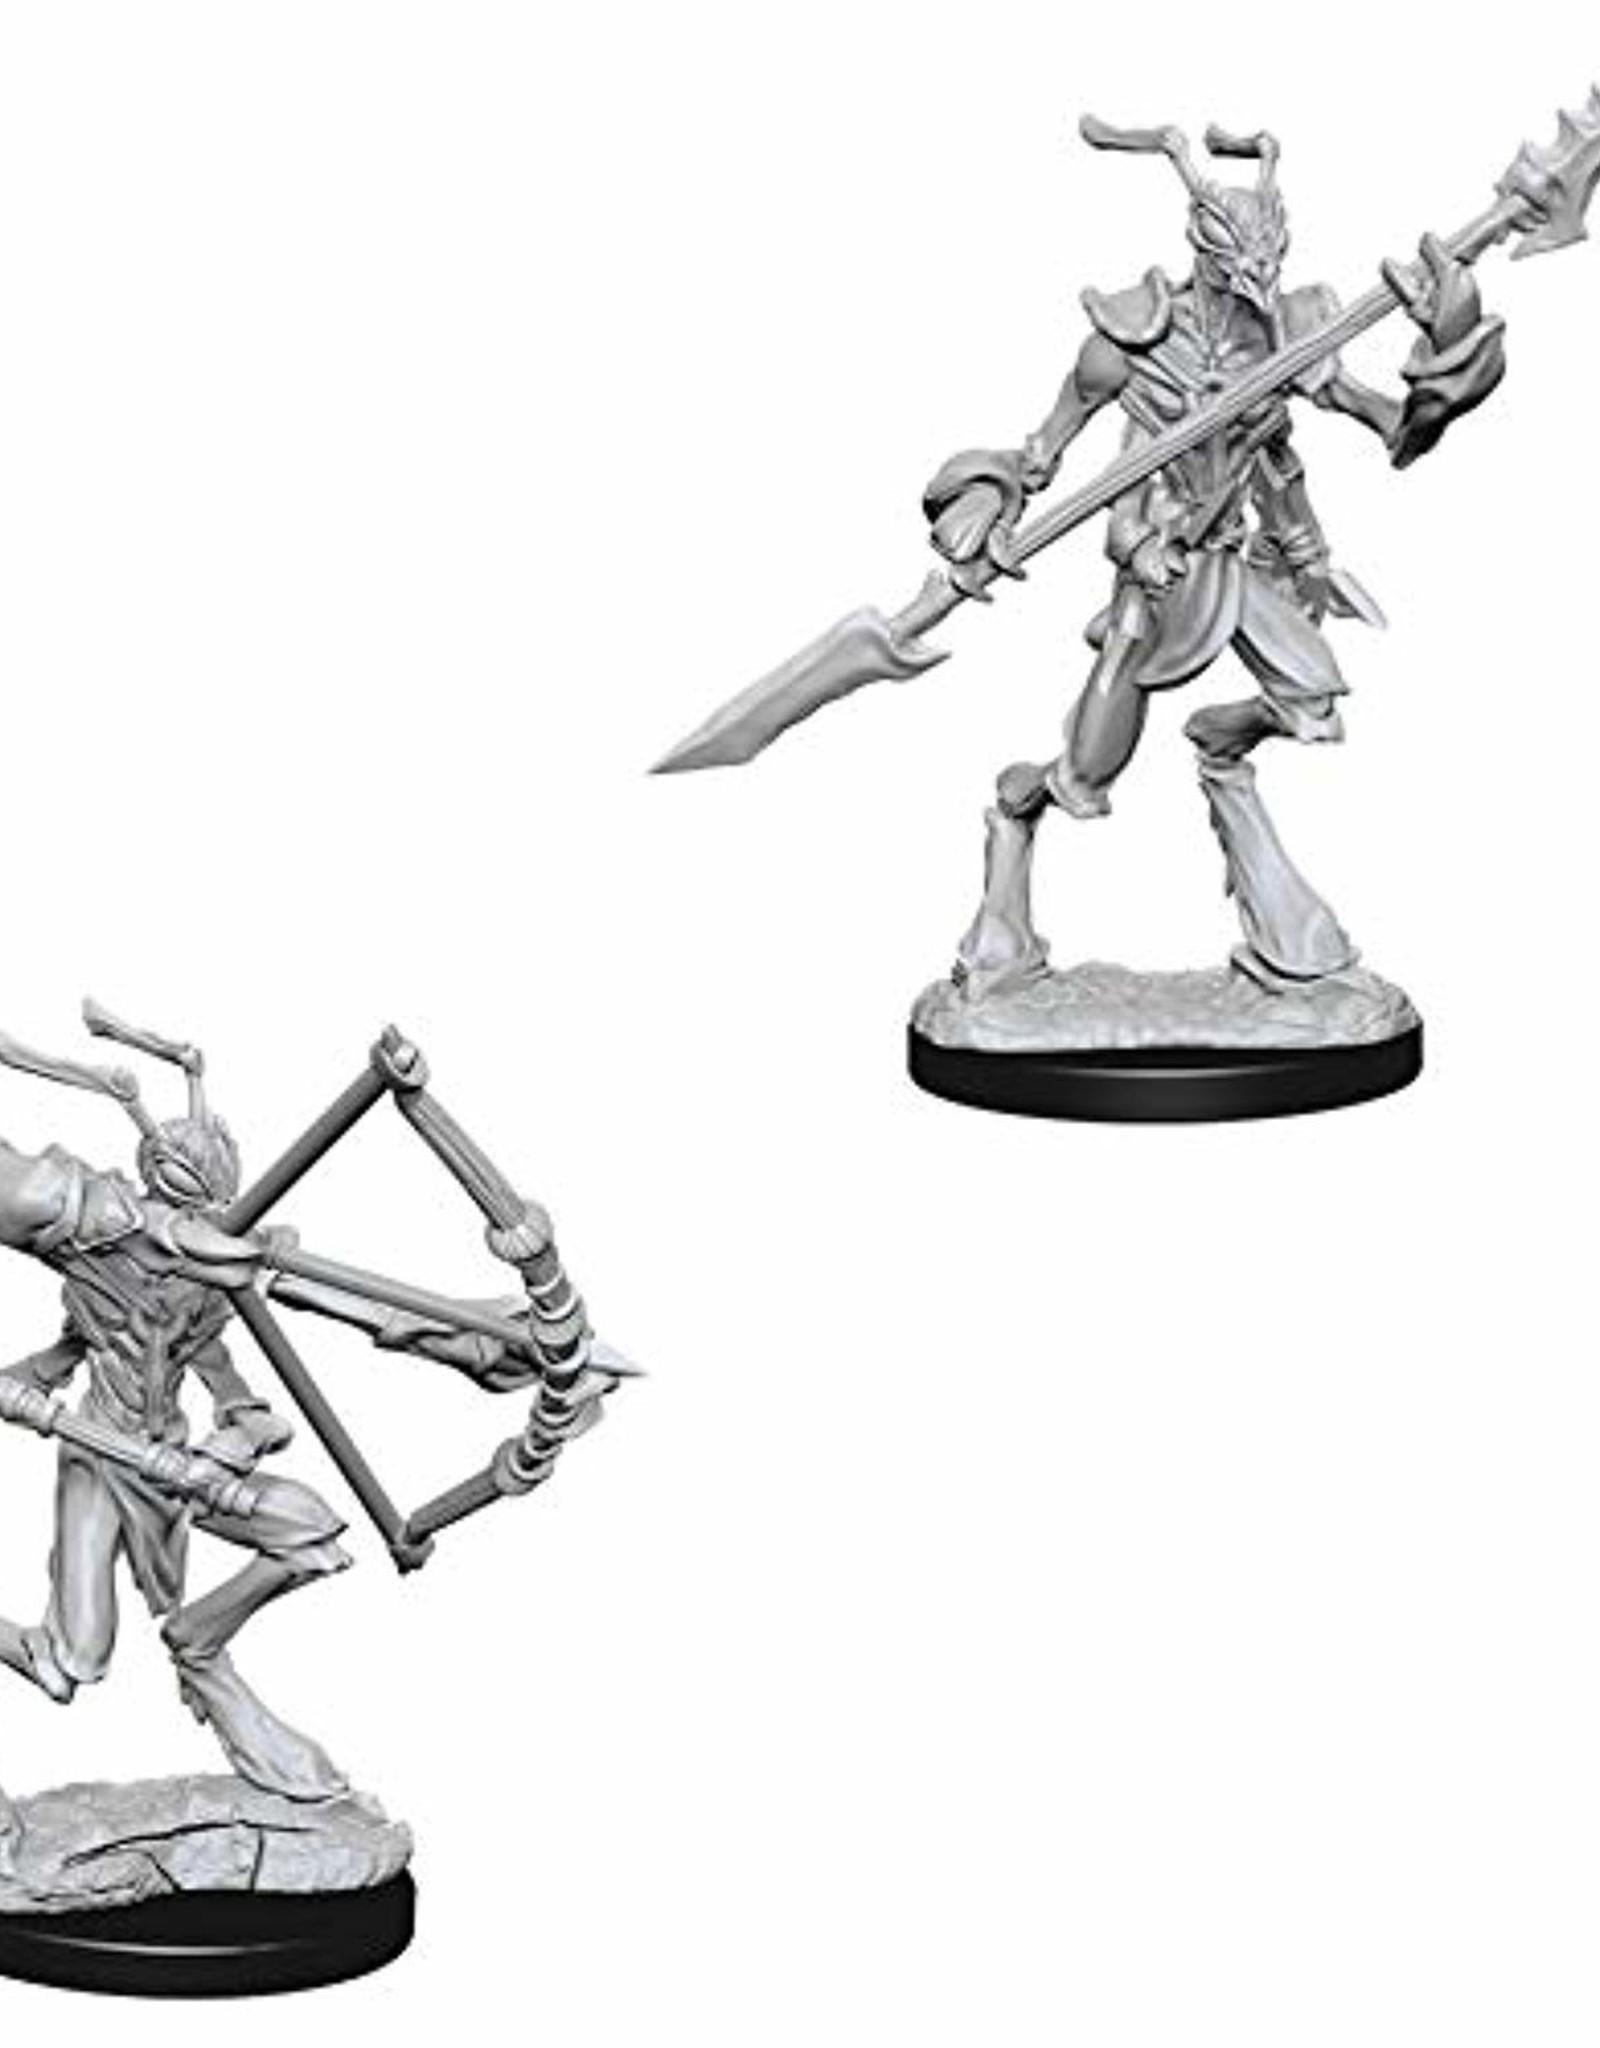 WizKids Dungeons & Dragons Nolzur's Marvelous Miniatures: Thri-Kreen